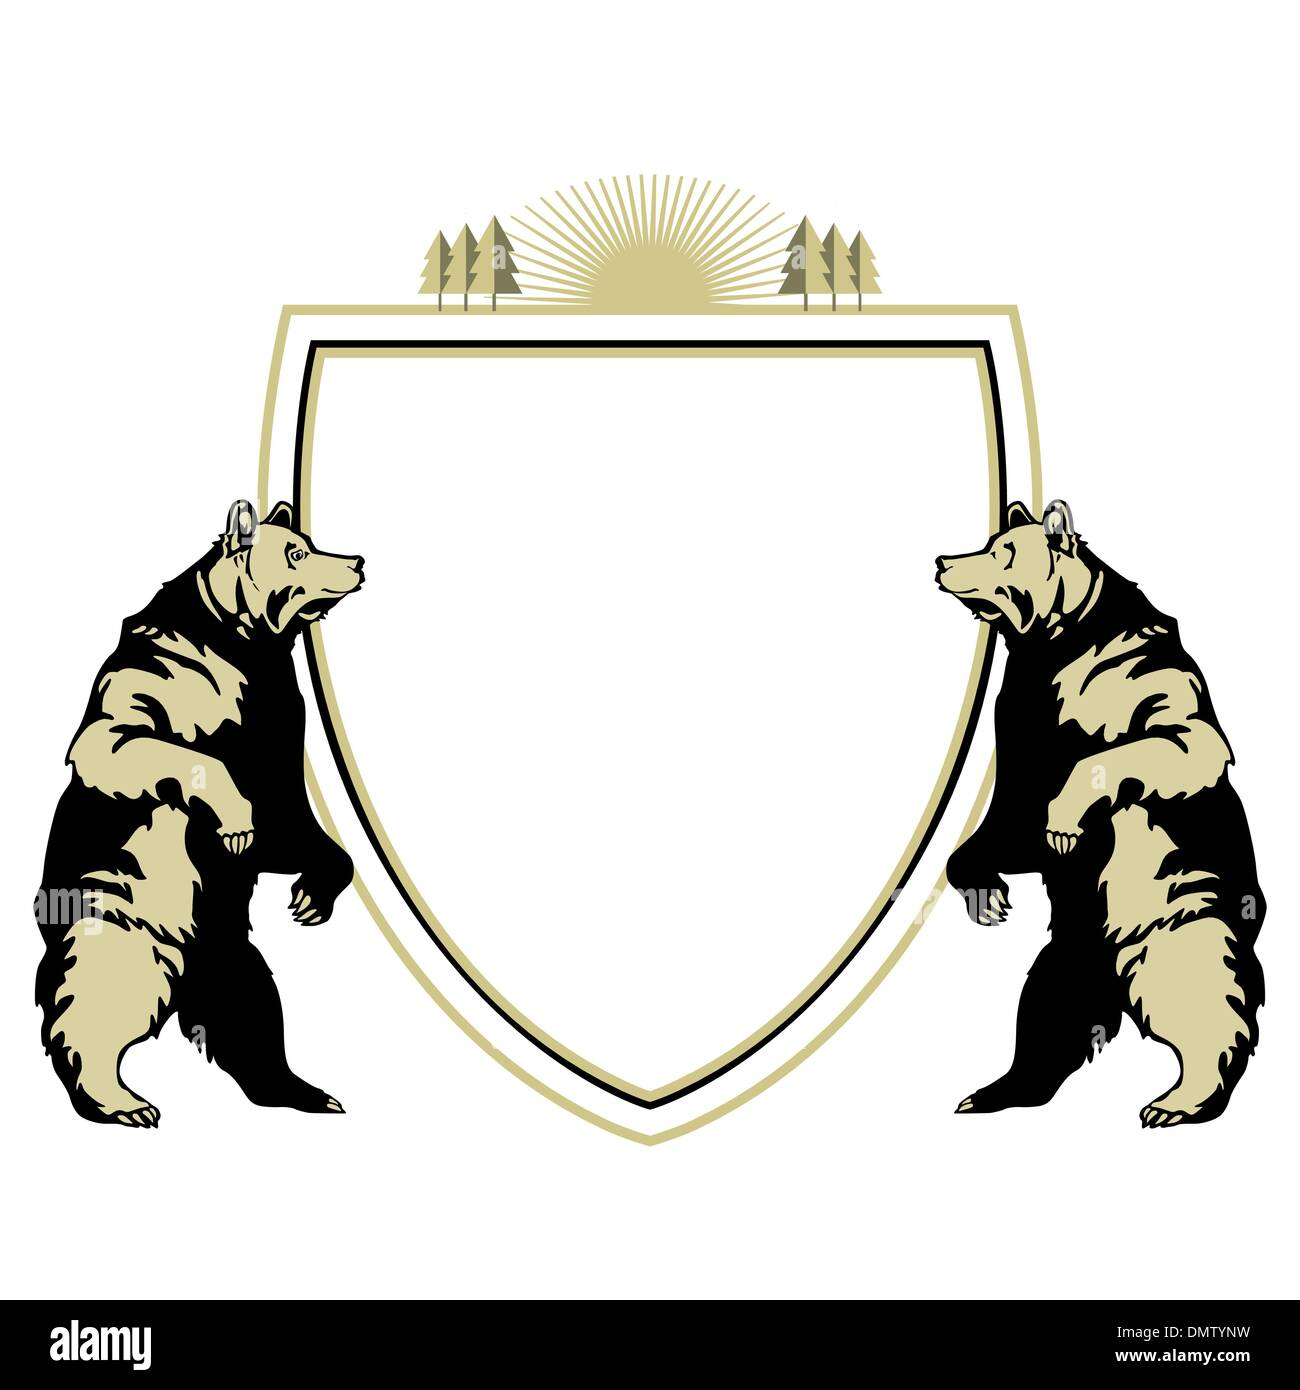 heraldic animal bear - Stock Image